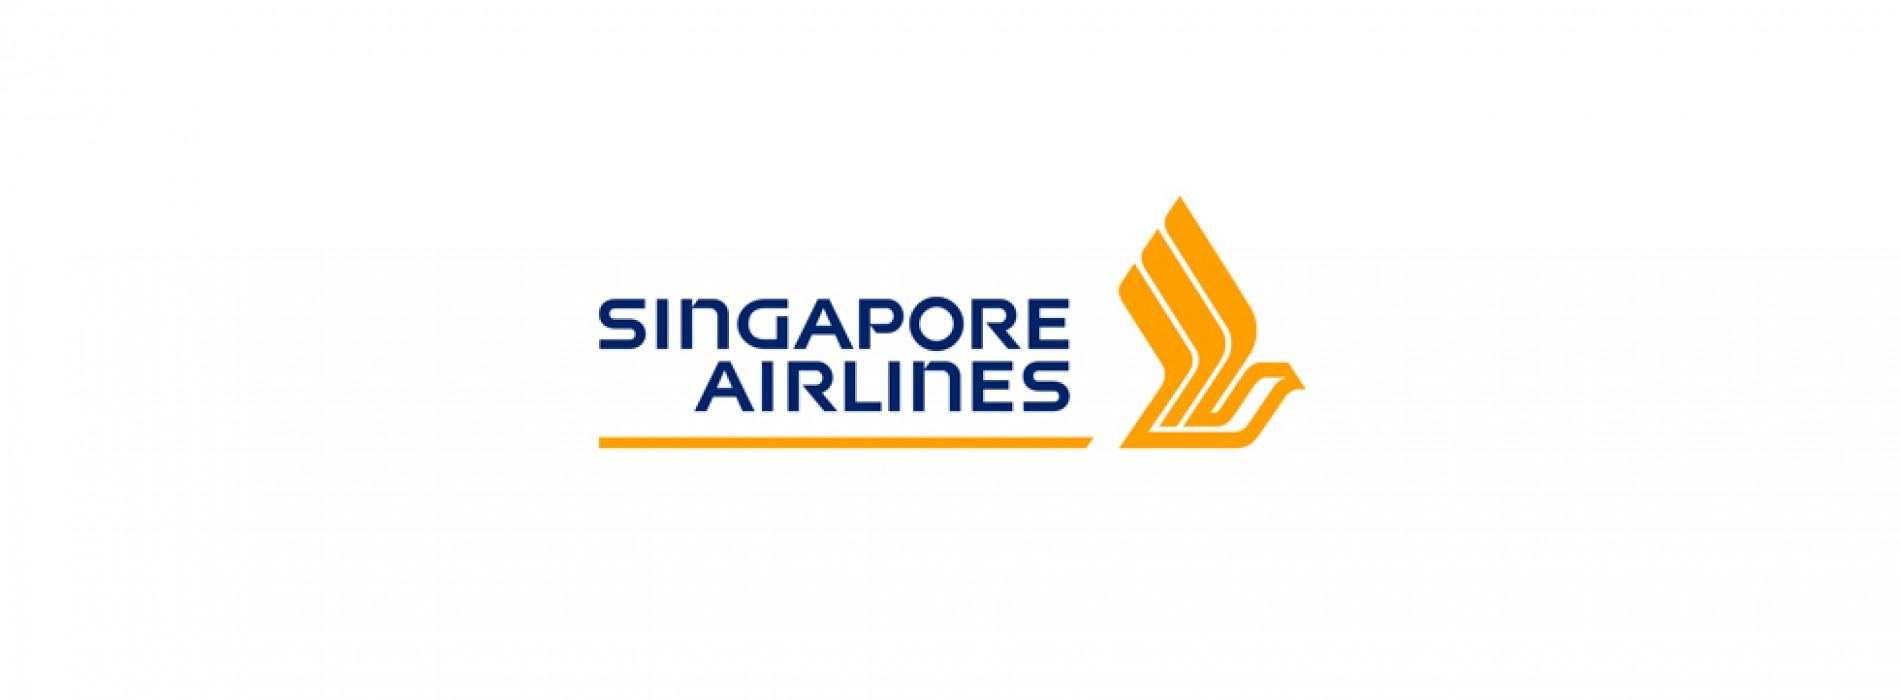 SIA adds more flights to Ahmedabad, Dhaka